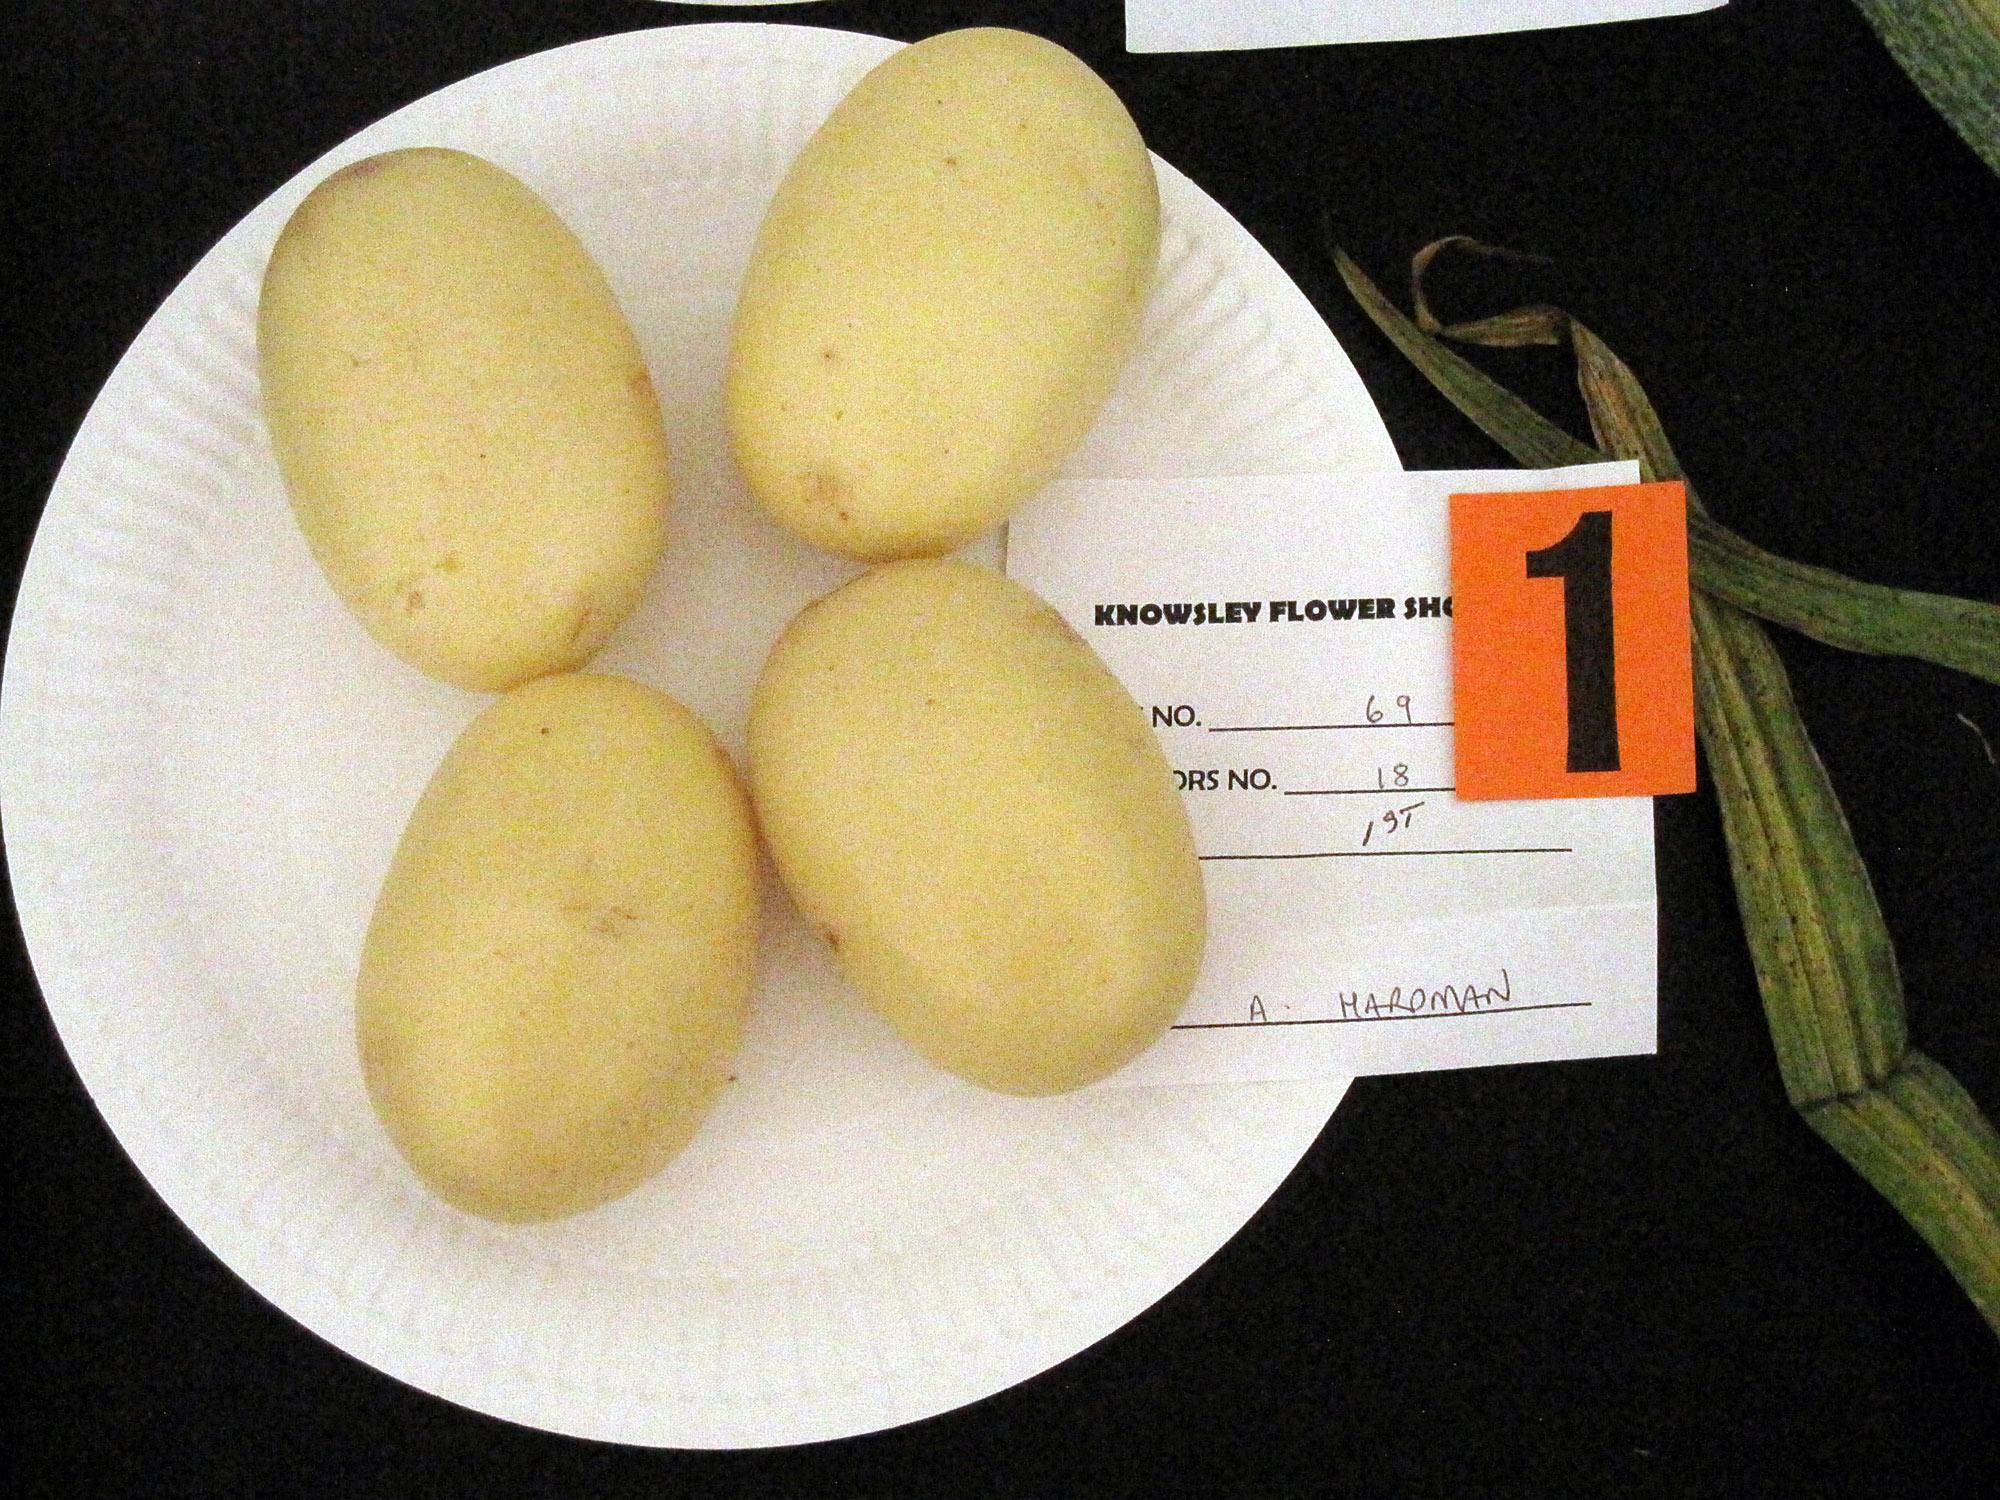 Photograph of four winning potatoes